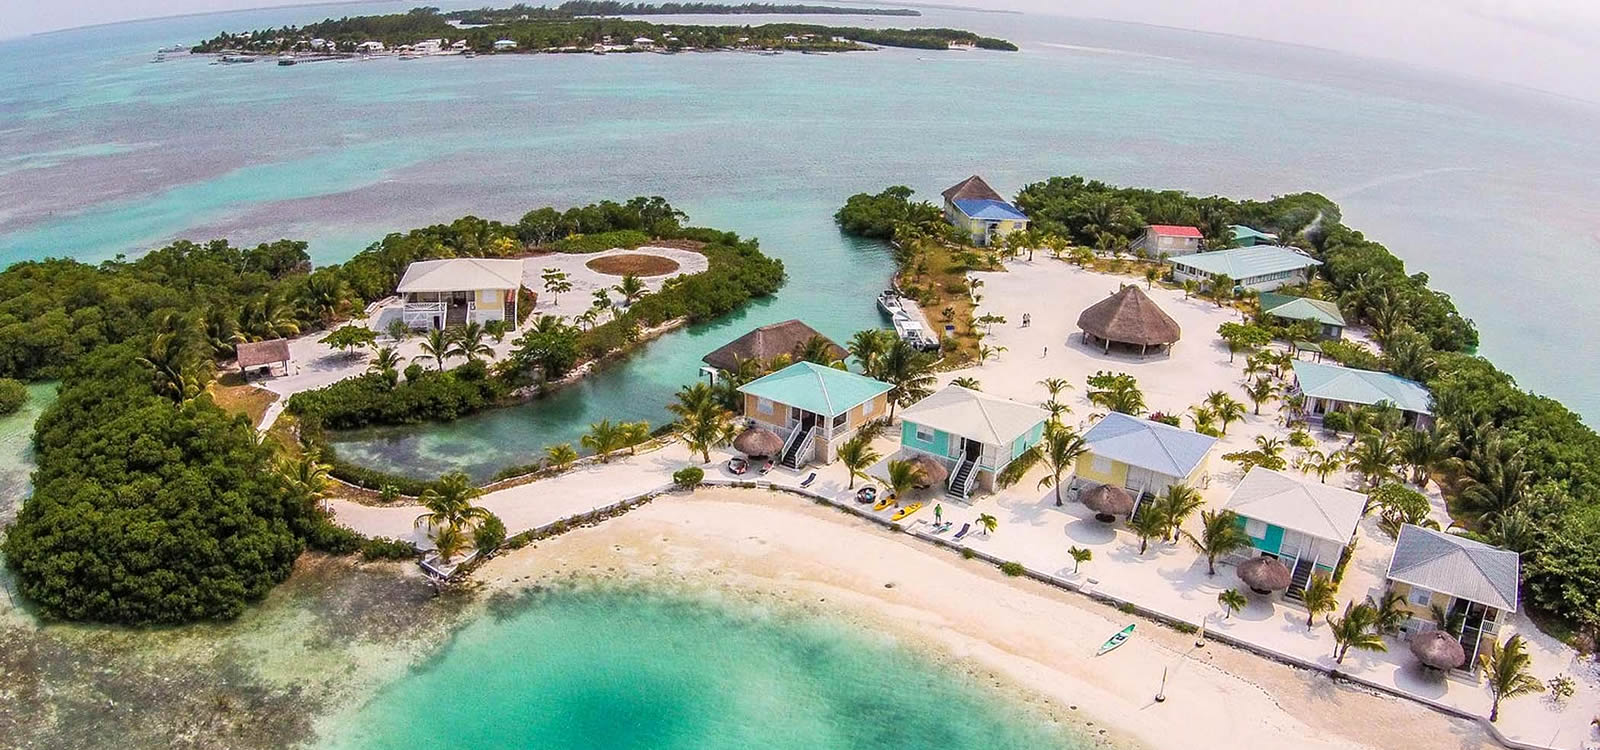 Boutique Private Island Resort For Sale In Belize 7th